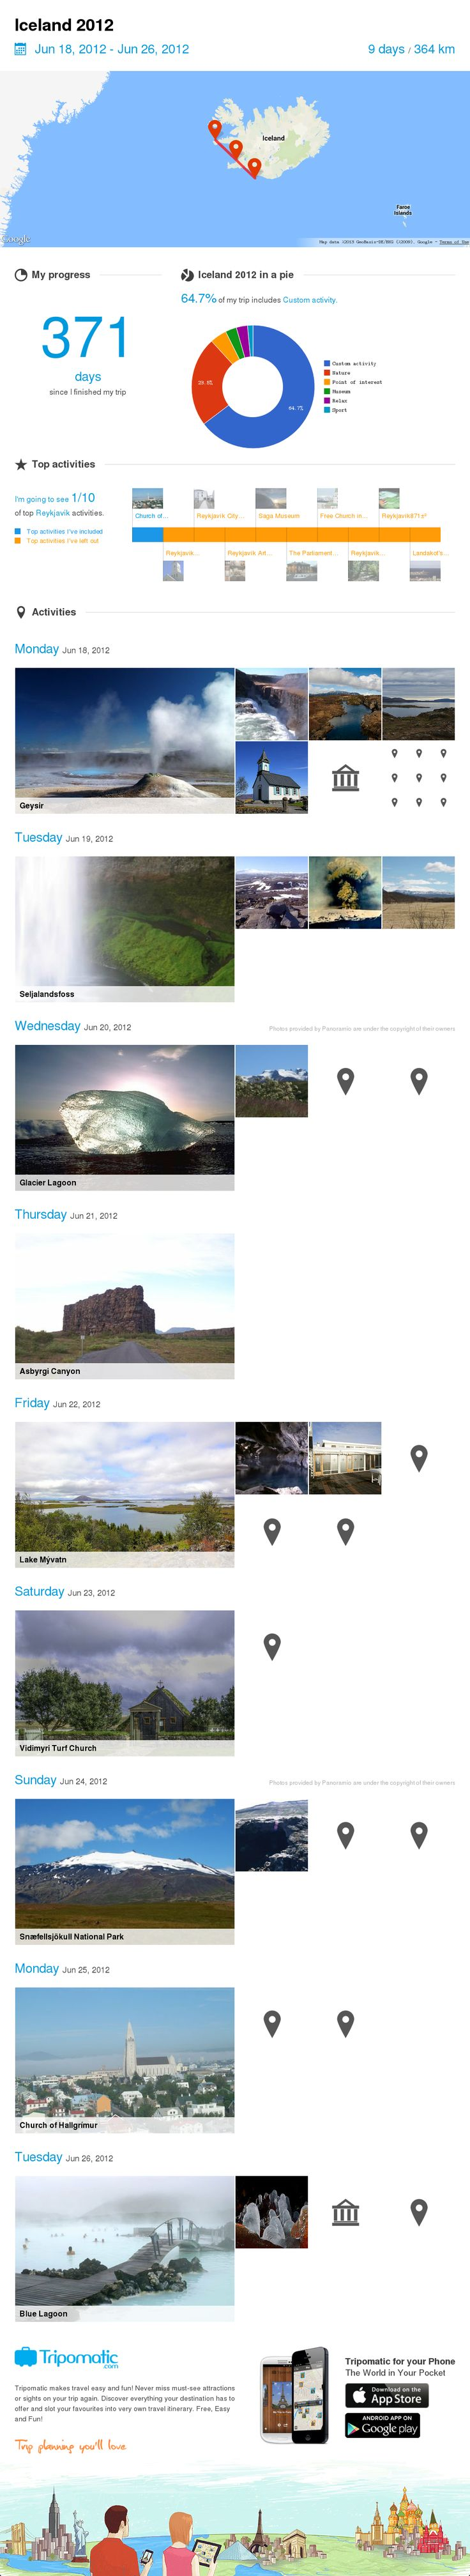 Check out my awesome trip to Vestmannaeyjar, Oliktok Point and Reykjavik!